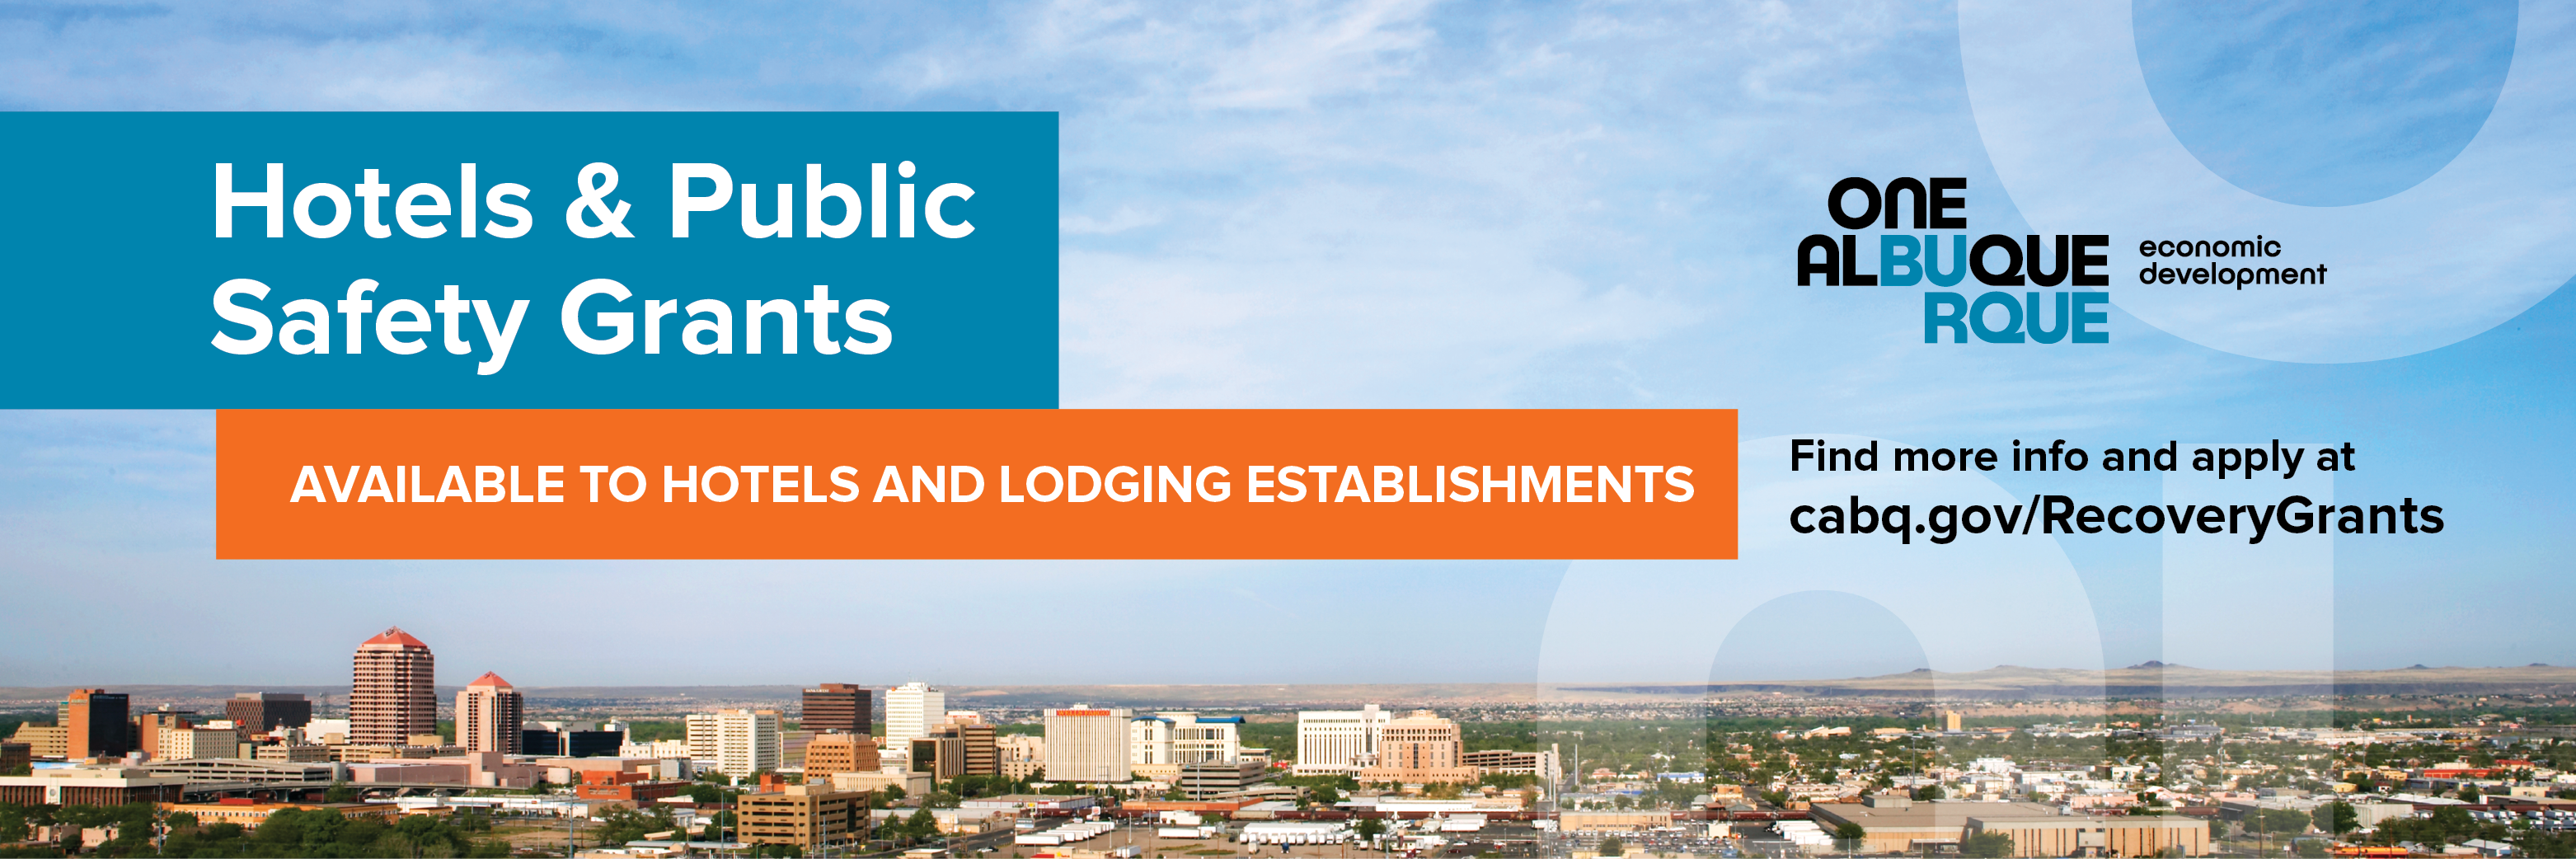 Hotels & Public Safety Grants Header